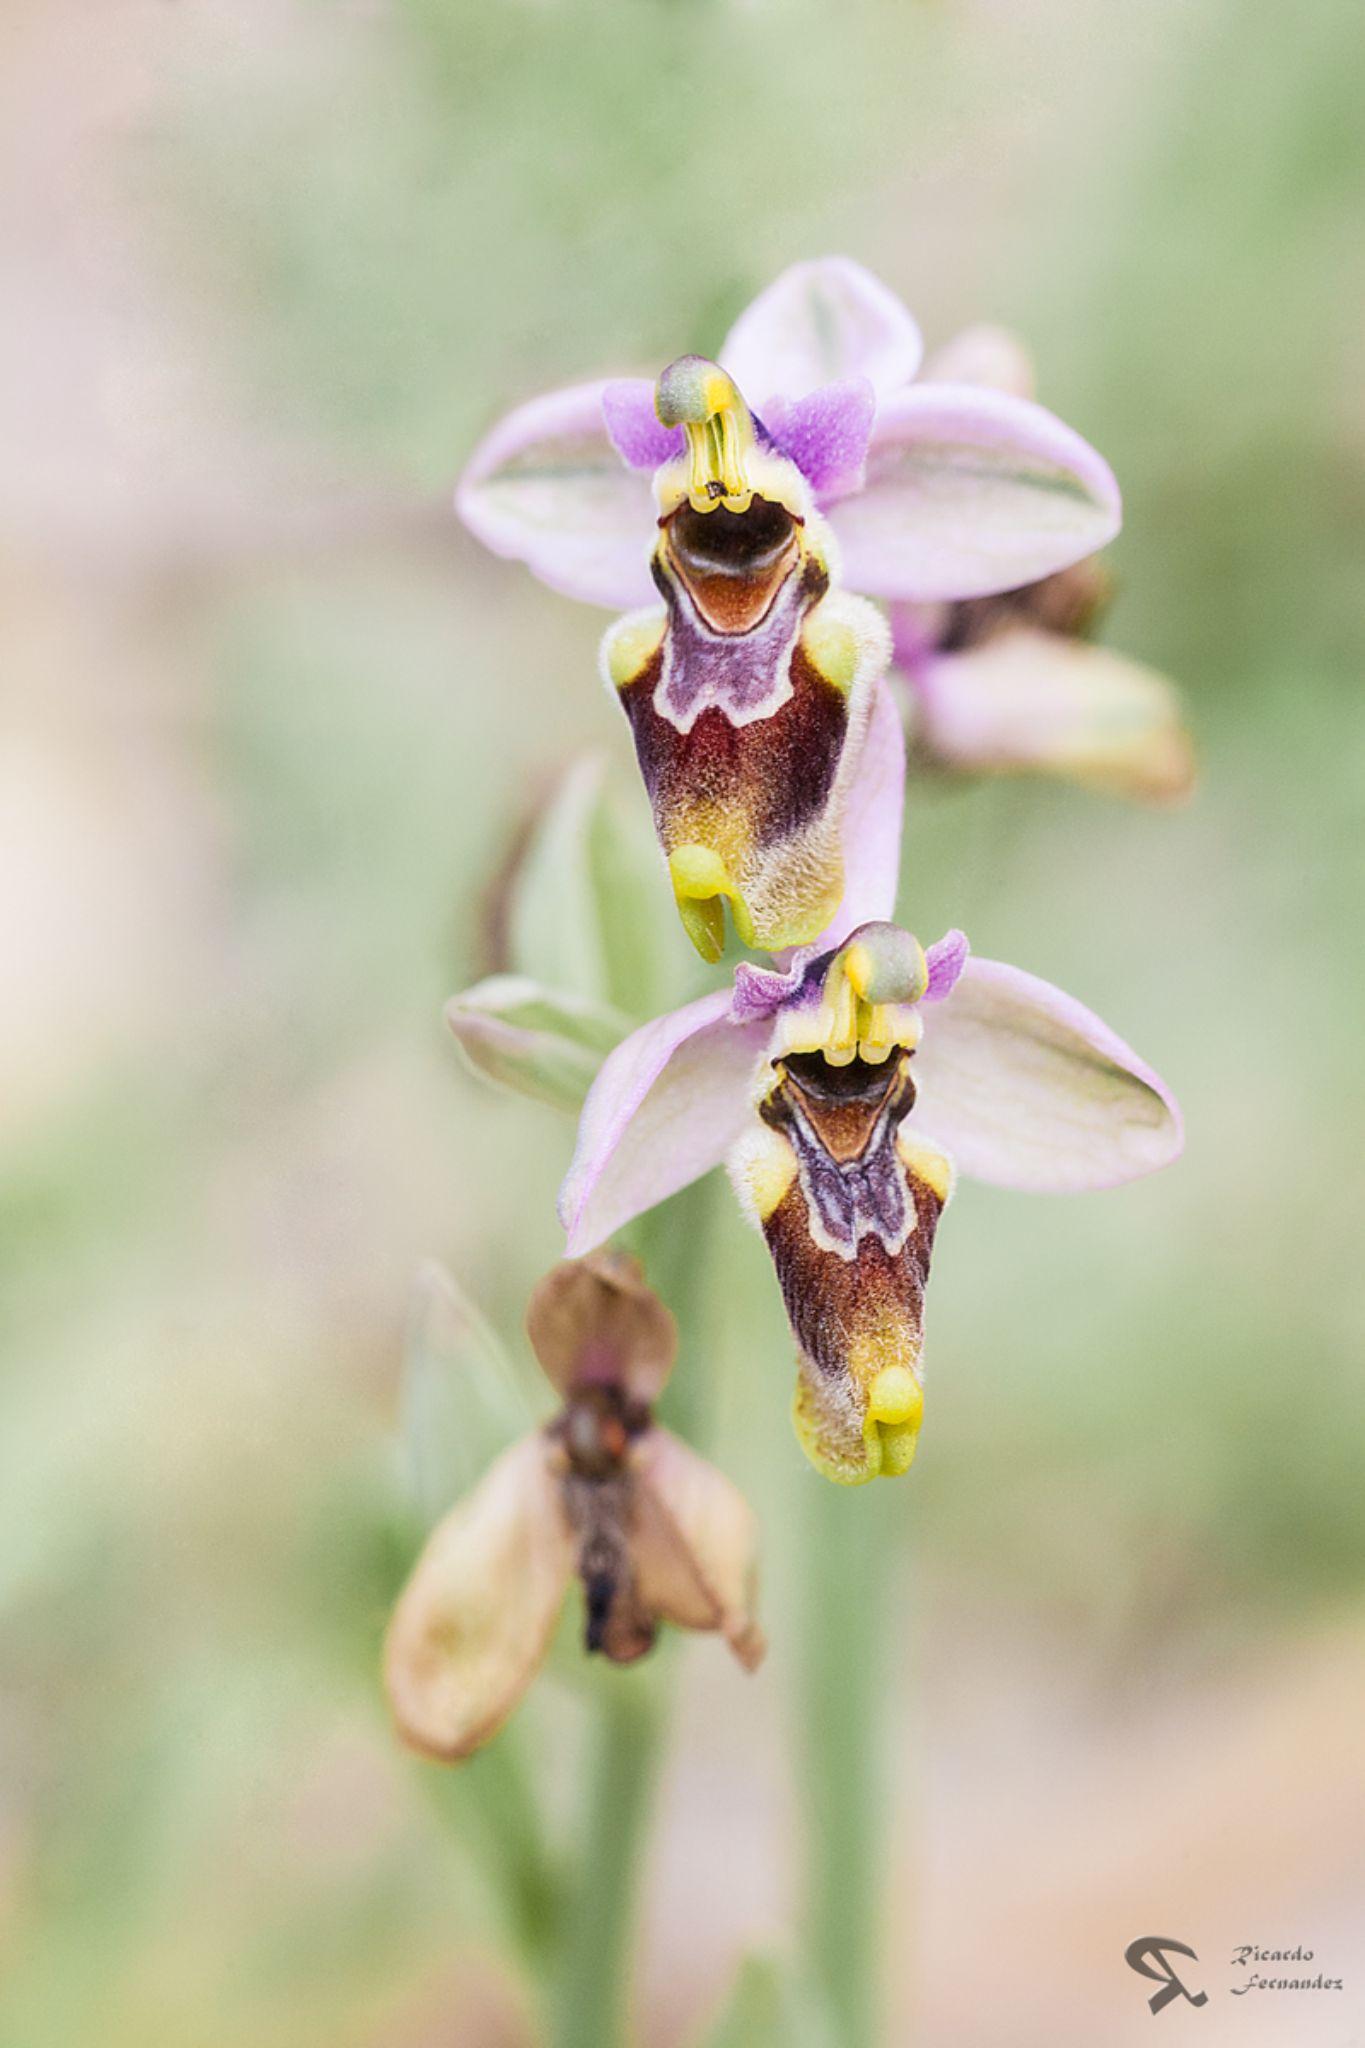 orquidea  by Ricardo Fernandez